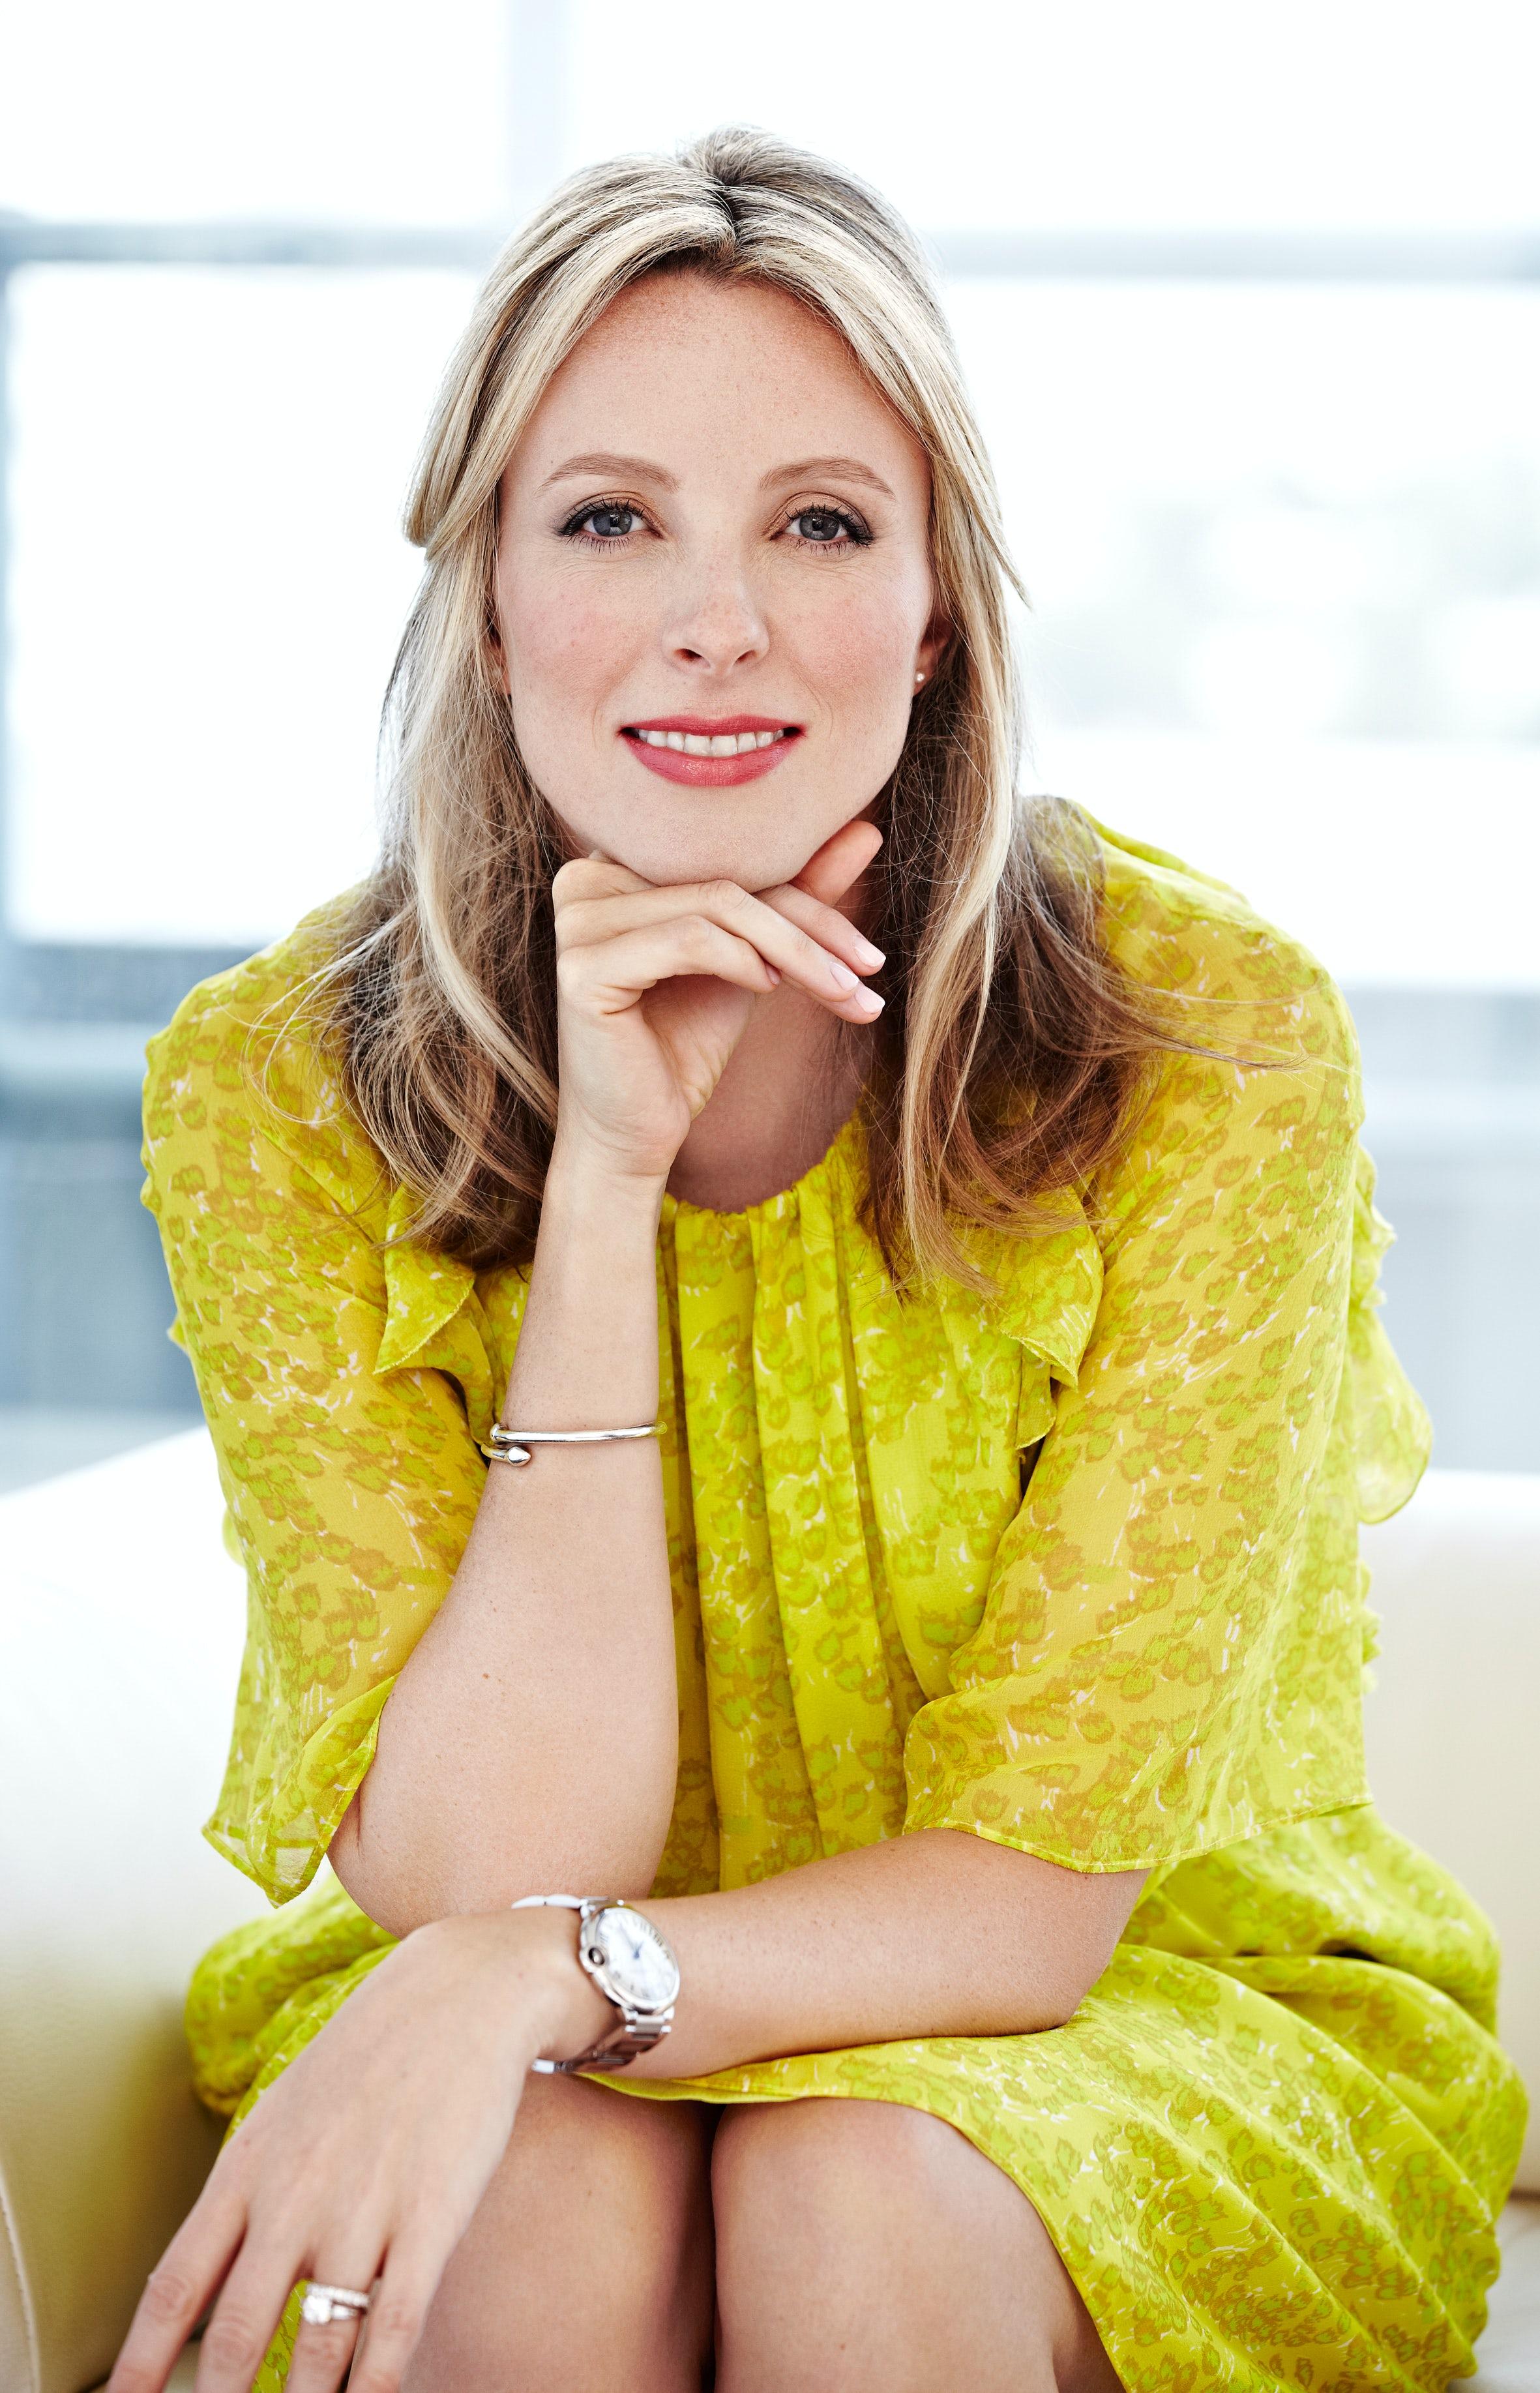 Farfetch chief strategy officer Stephanie Phair